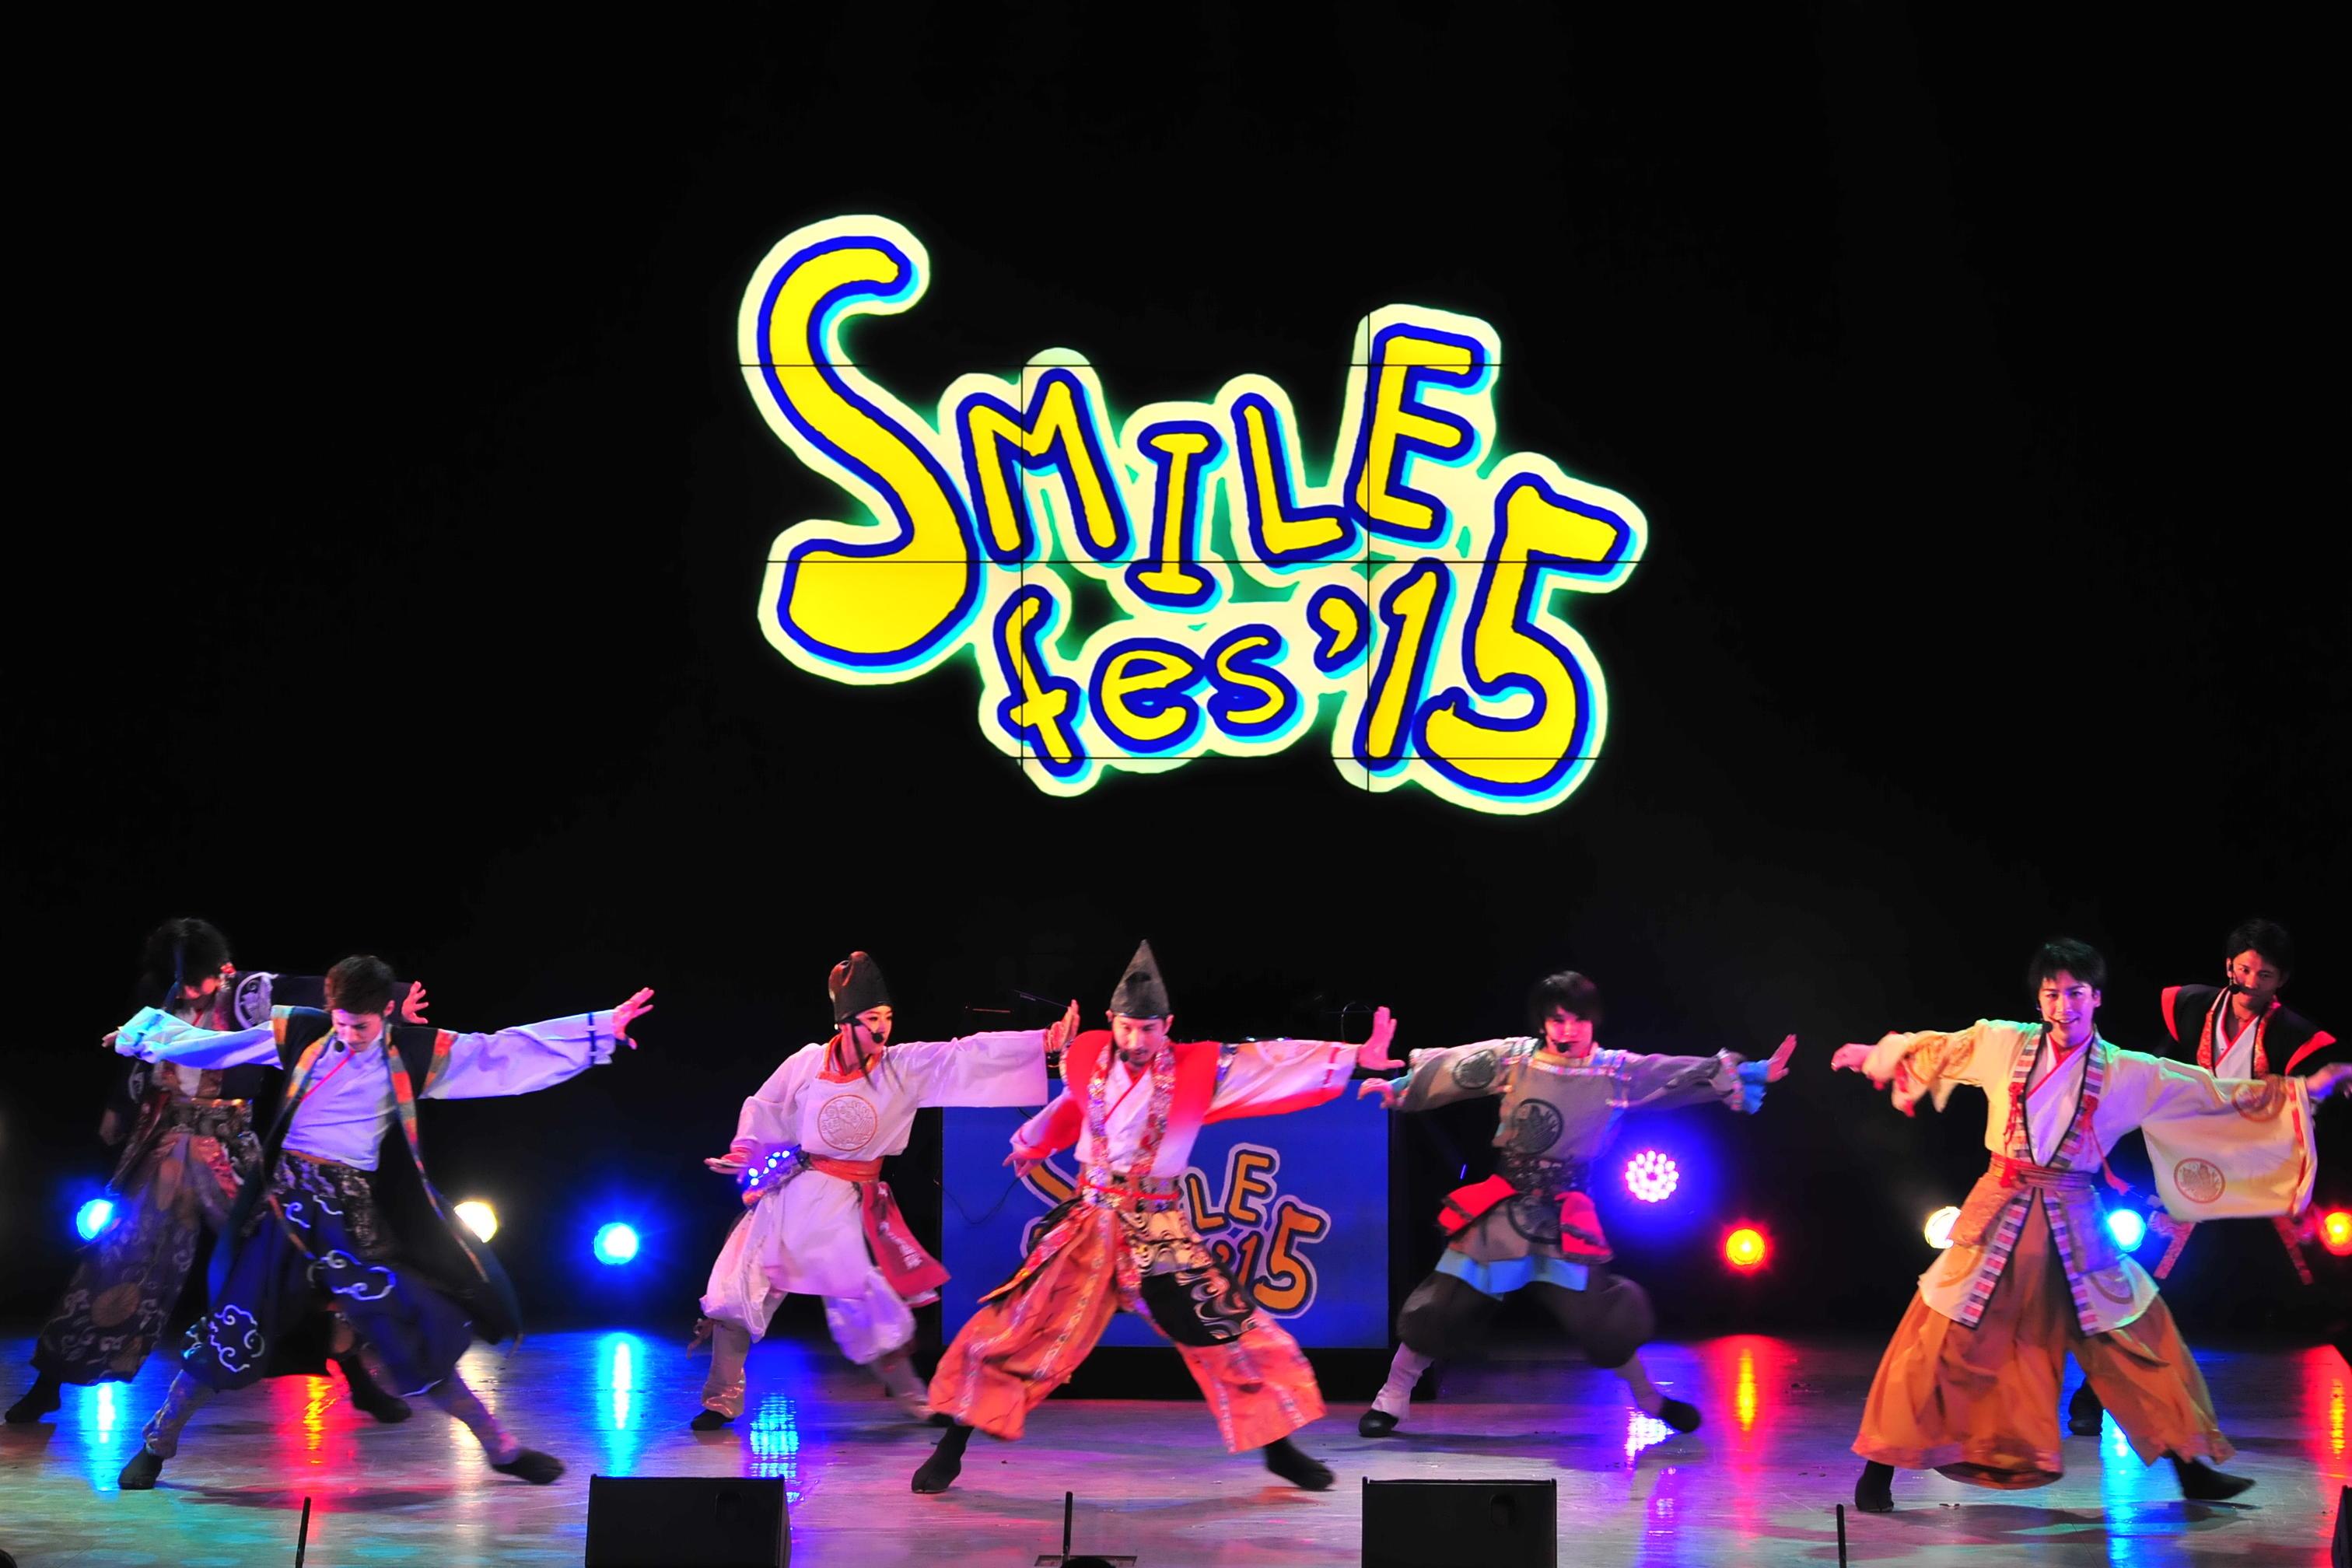 http://news.yoshimoto.co.jp/20151231142514-a129b85c88704eda2e5c4b80627af7dbf35bfc5f.jpg